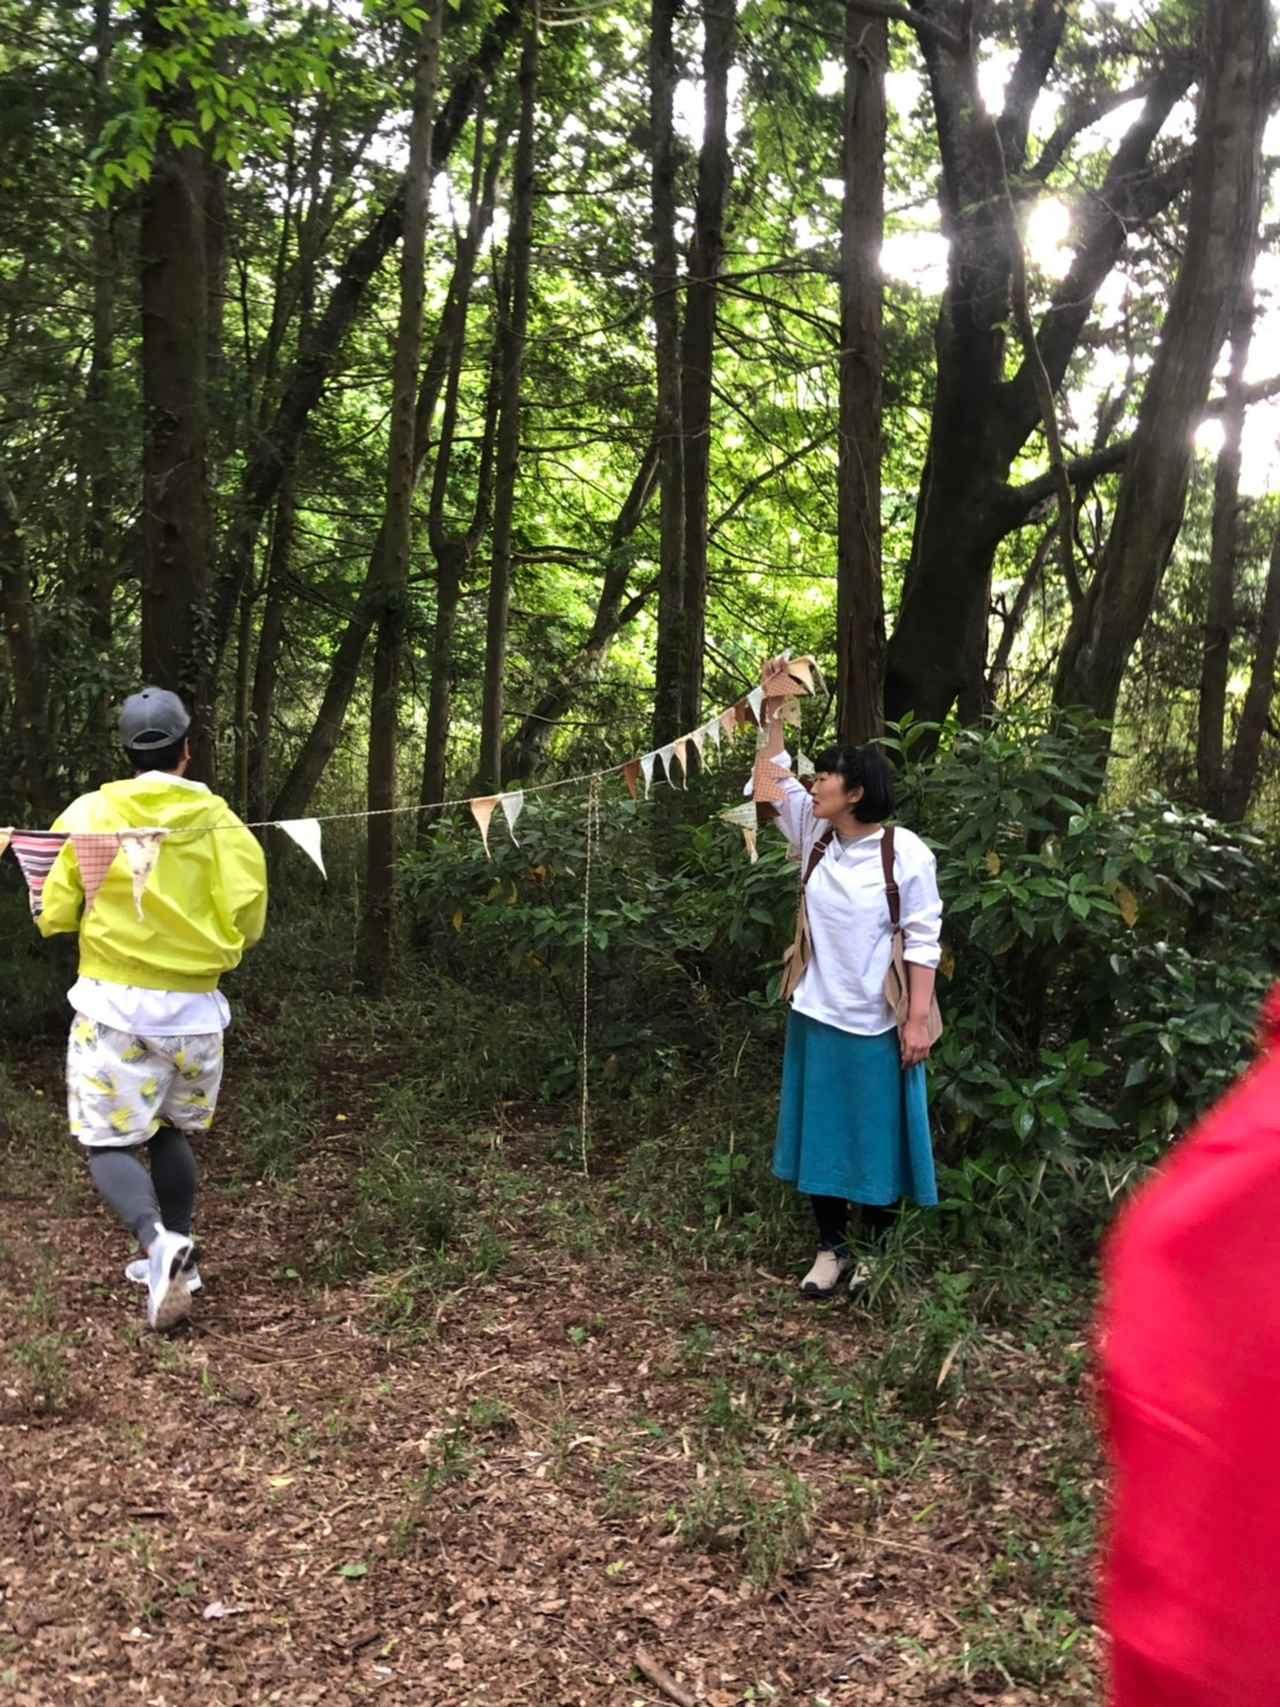 Images : 9番目の画像 - おぎやはぎのハピキャン「映えキャンプ」写真集 - ハピキャン(HAPPY CAMPER)